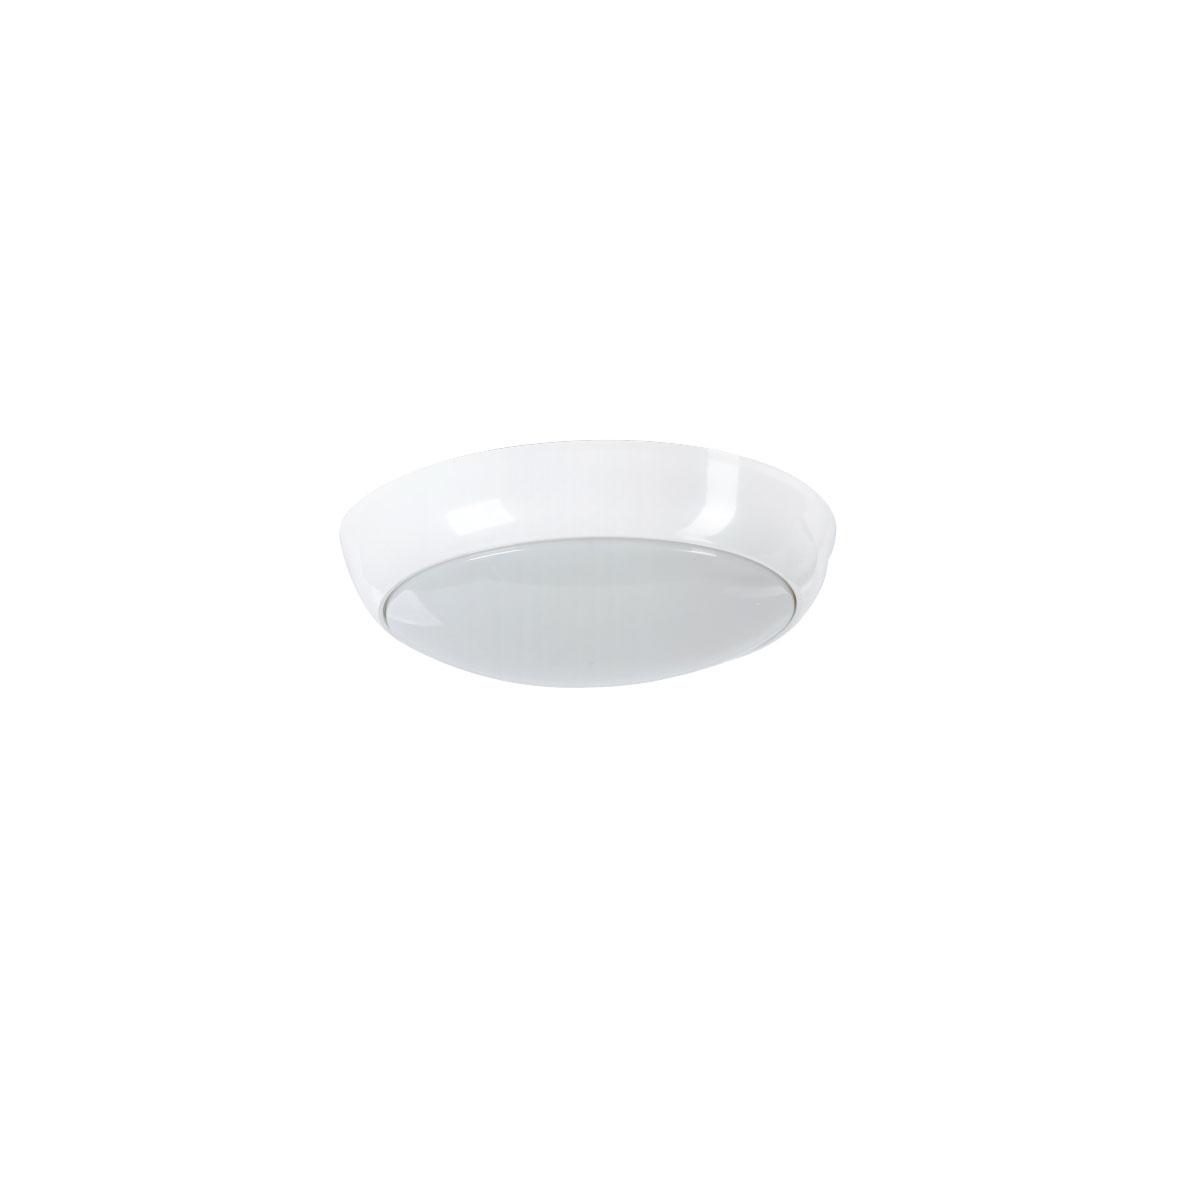 چراغ سقفى روکار SH-2612